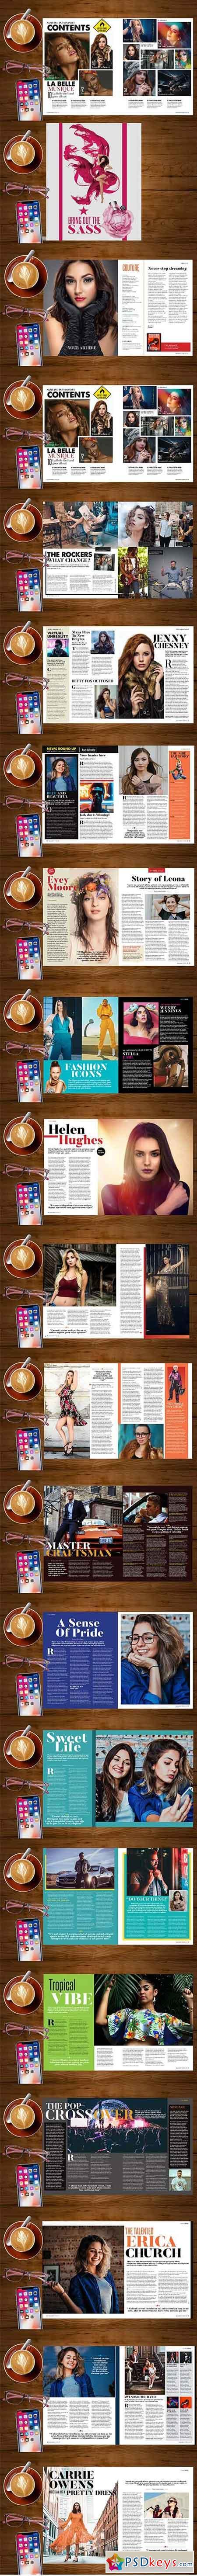 Magazine Template 3165770